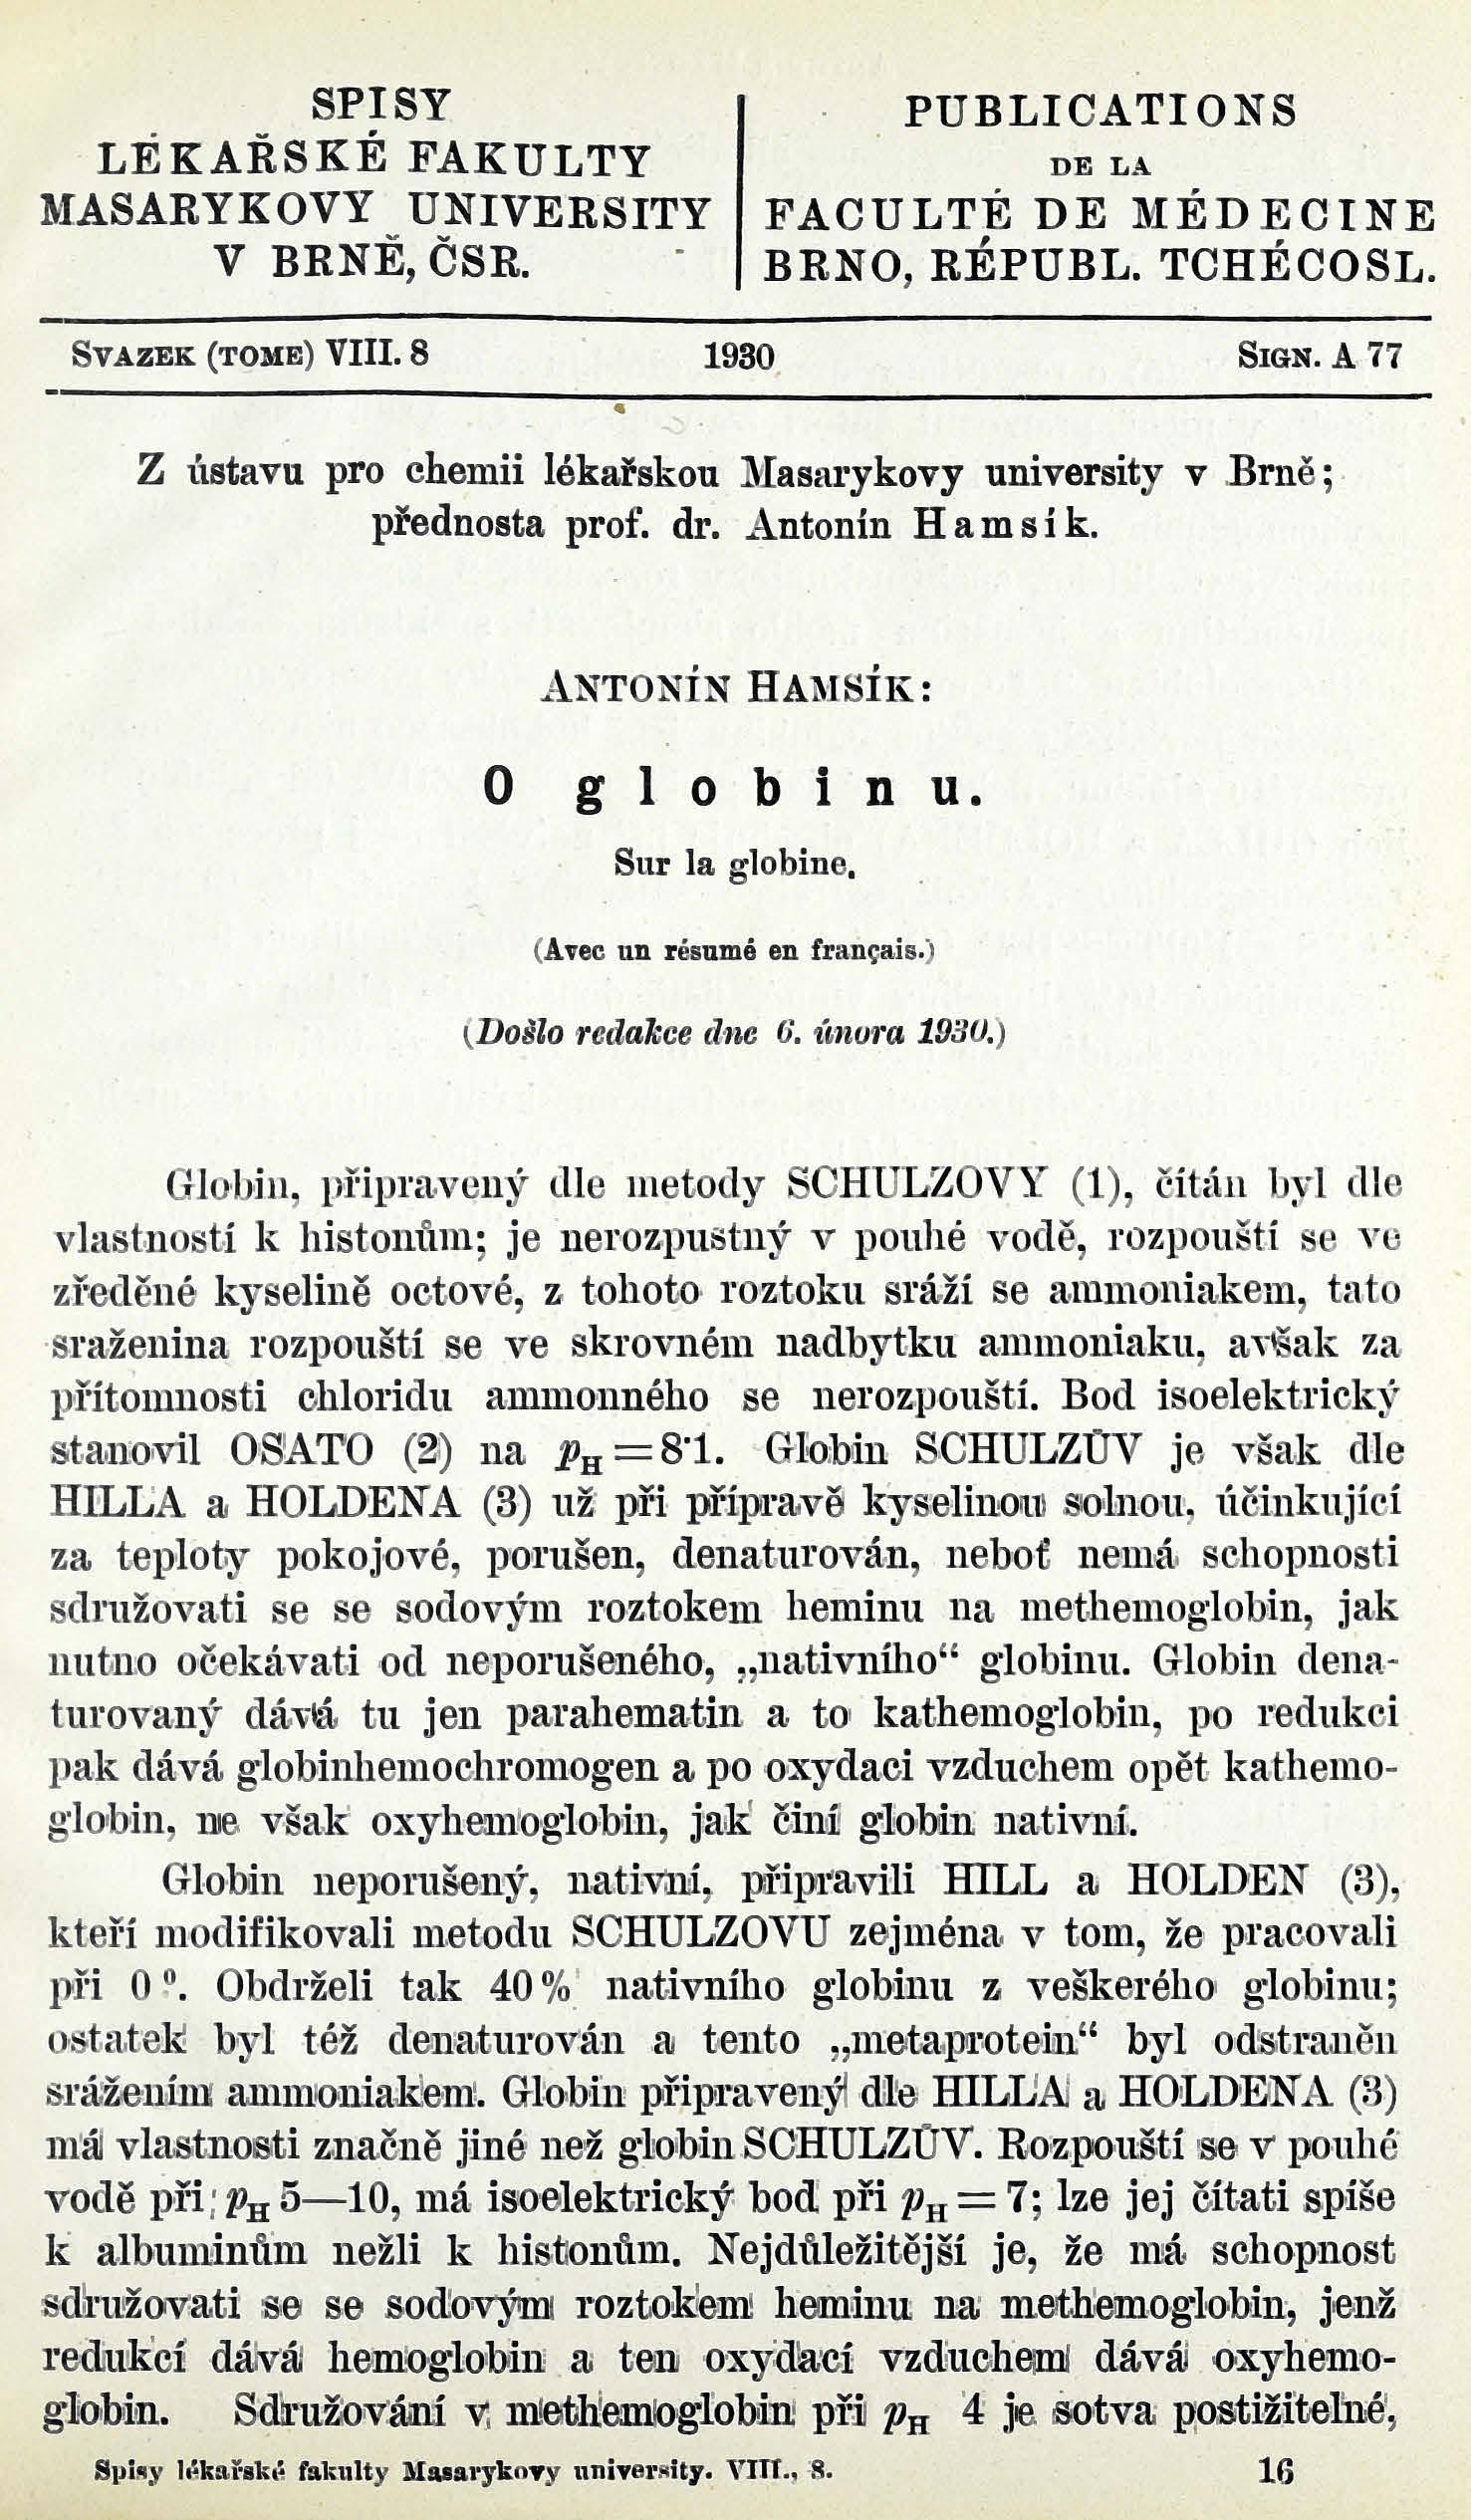 Obálka pro O globinu / Sur la globine